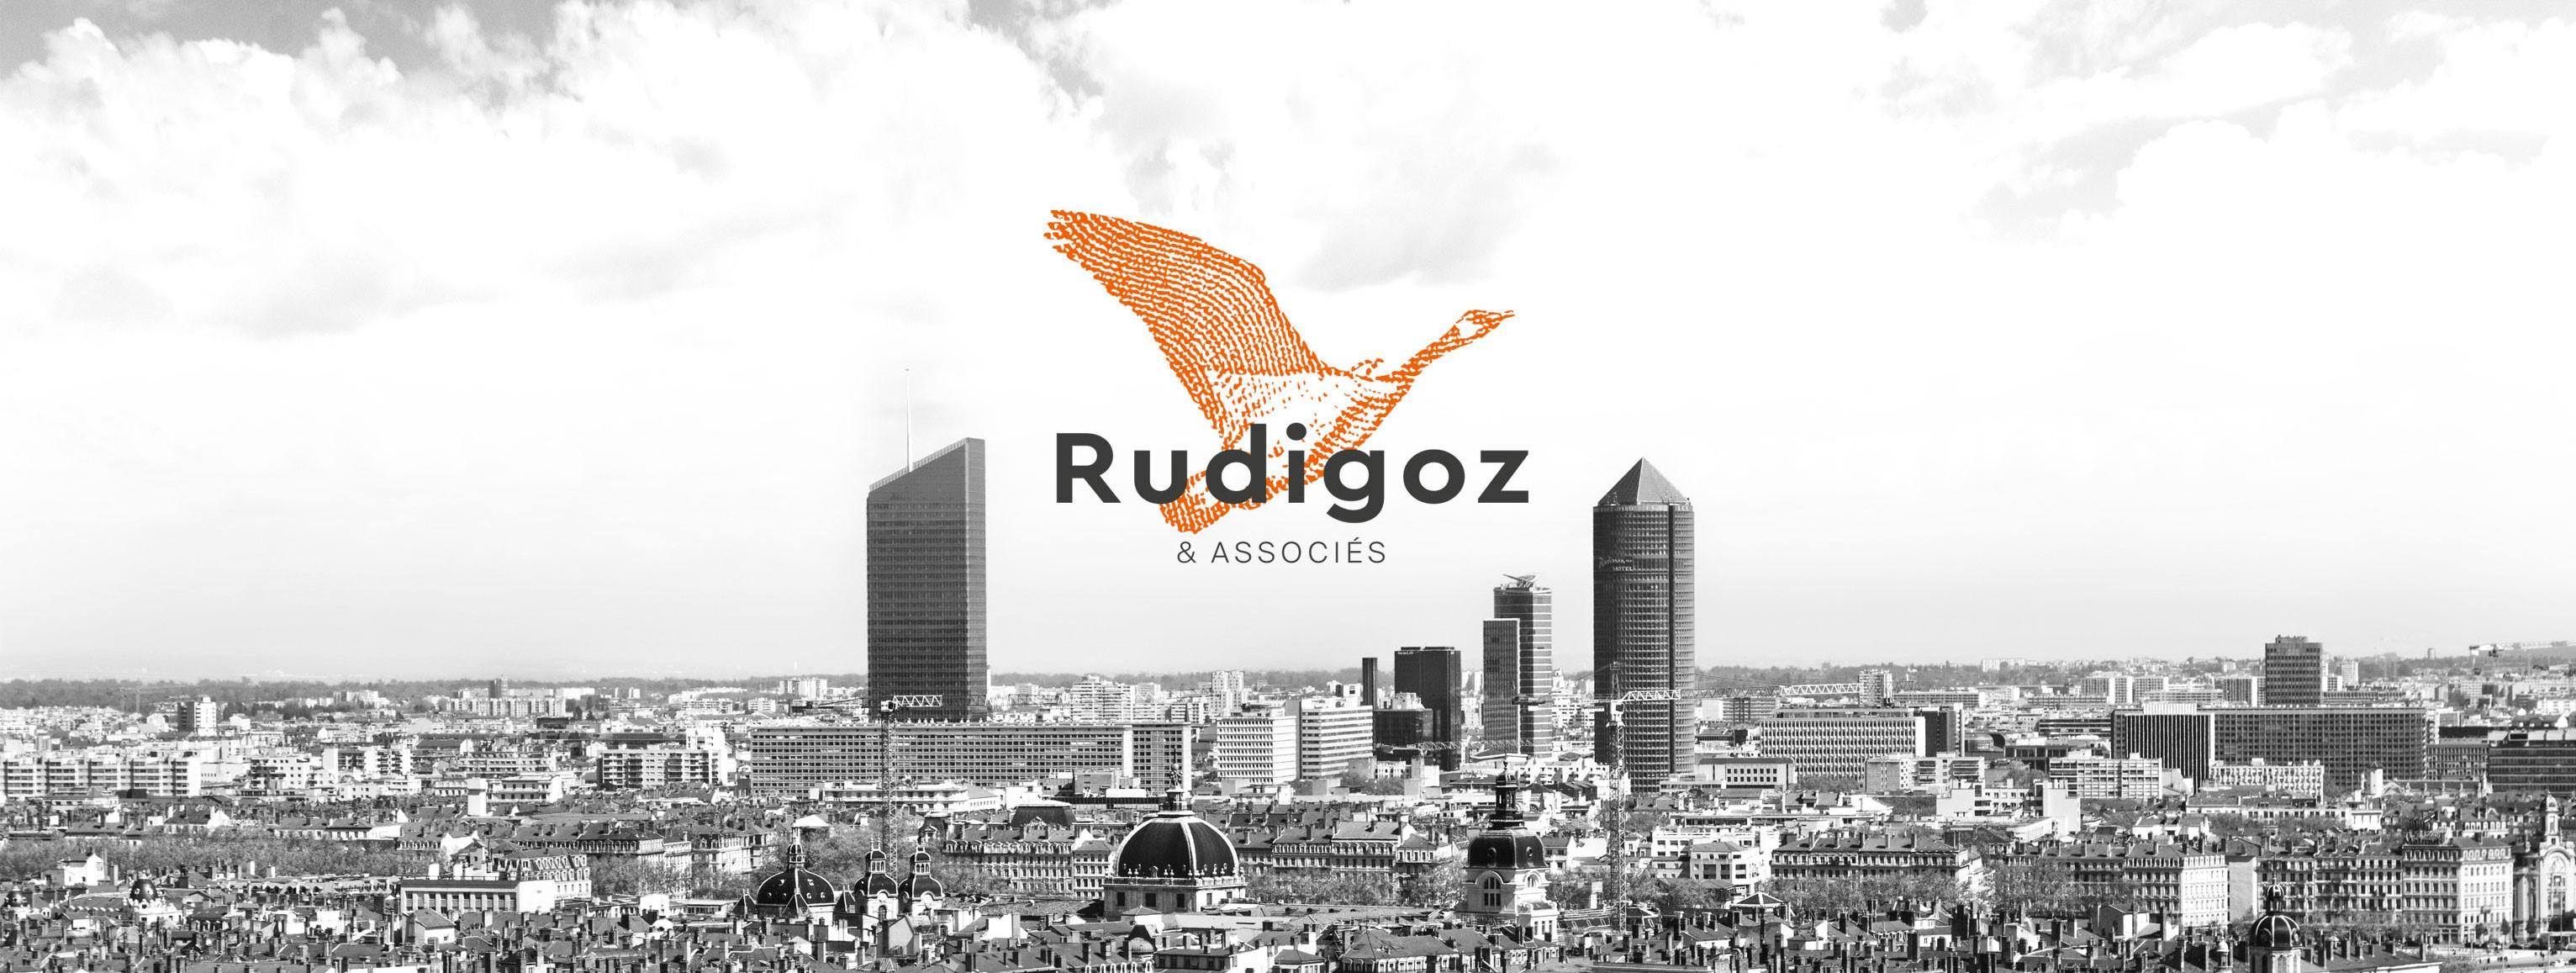 RUDIGOZ & ASSOCIES - Image